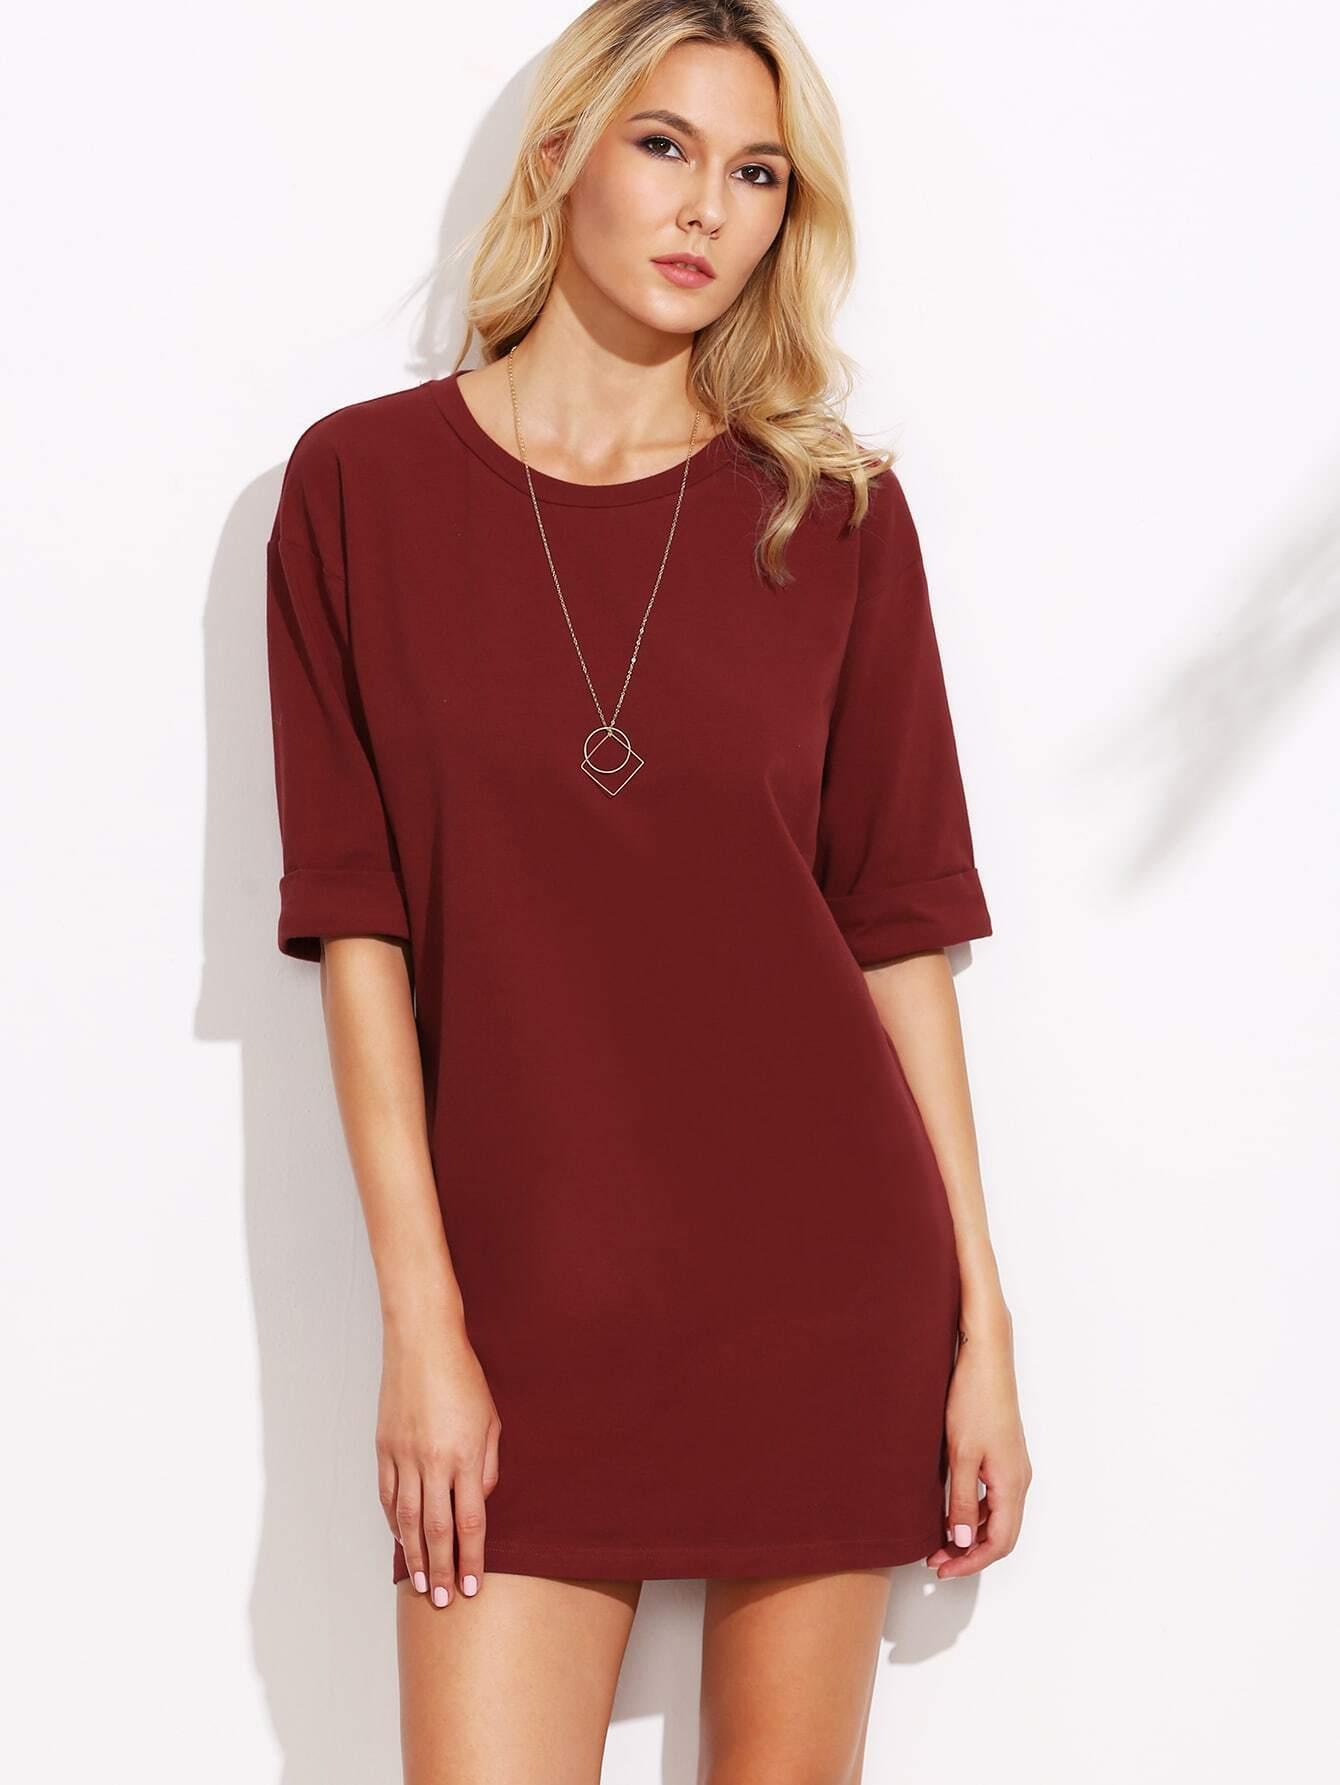 f2ad44ab90 Burgundy Drop Shoulder Roll Sleeve Tee Dress EmmaCloth-Women ...